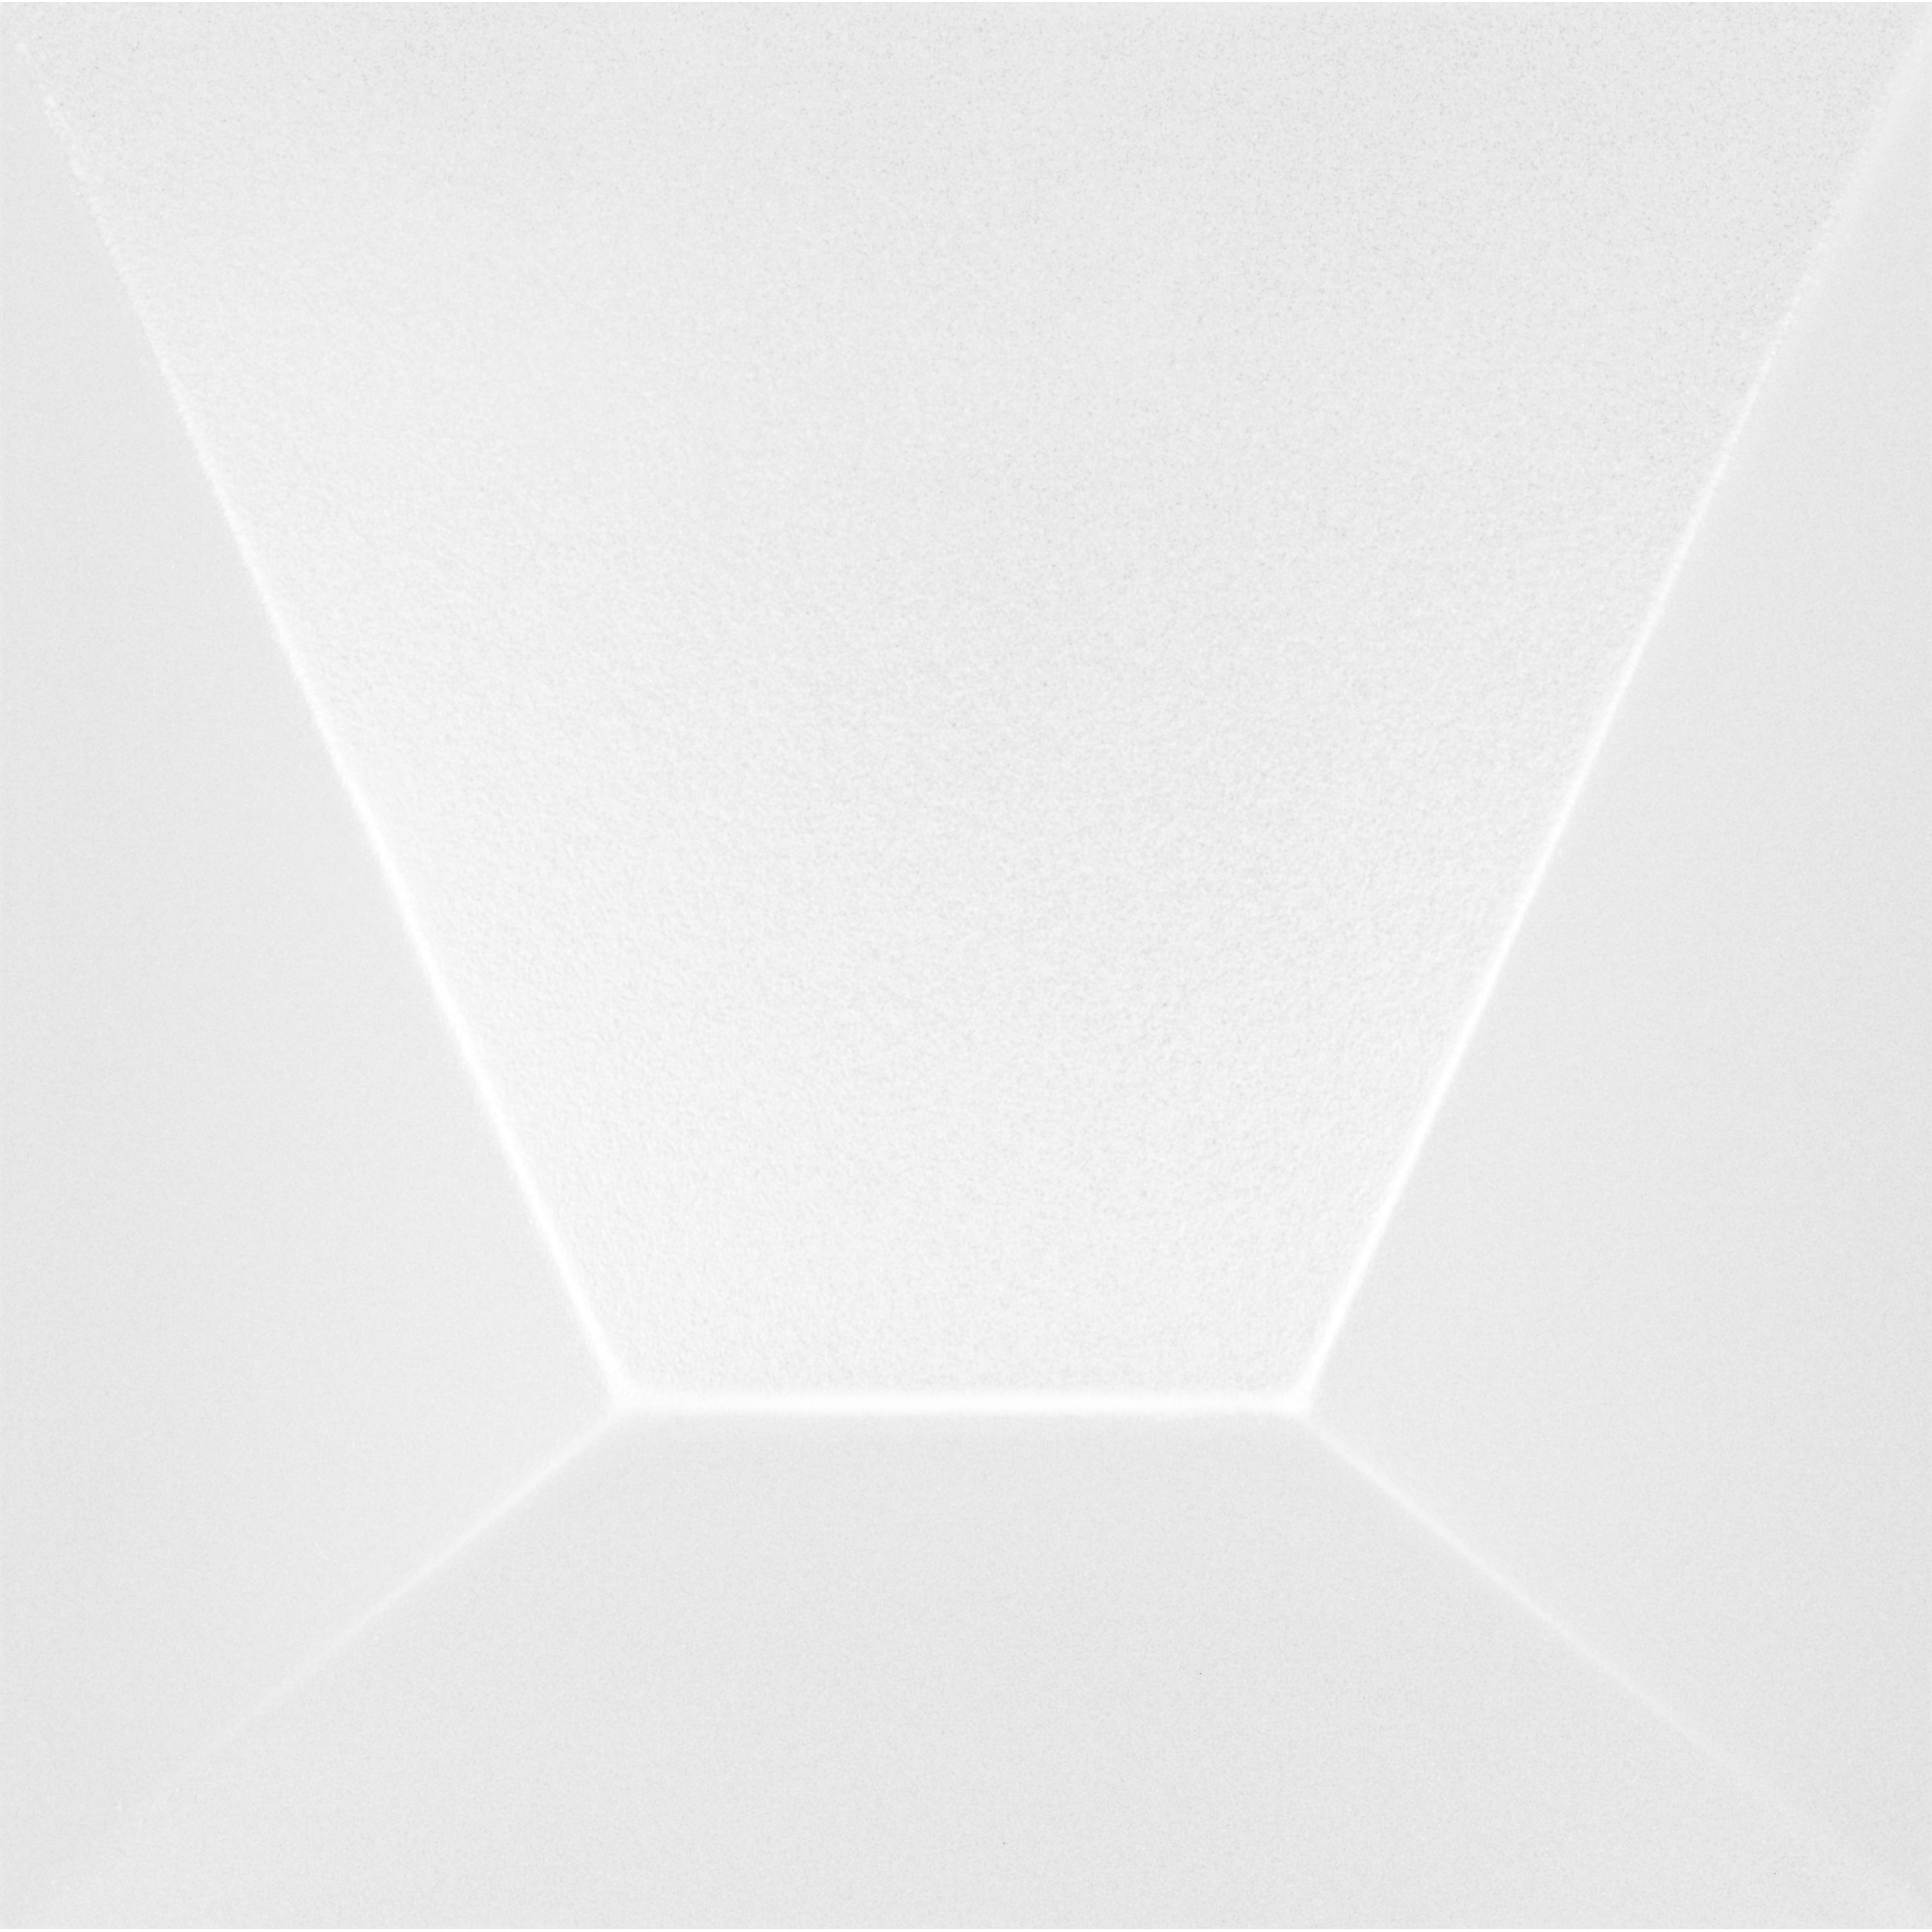 Revestimento Roca Tipo A 154x154 cm Acetinado Block White 043m - Branco Fosco